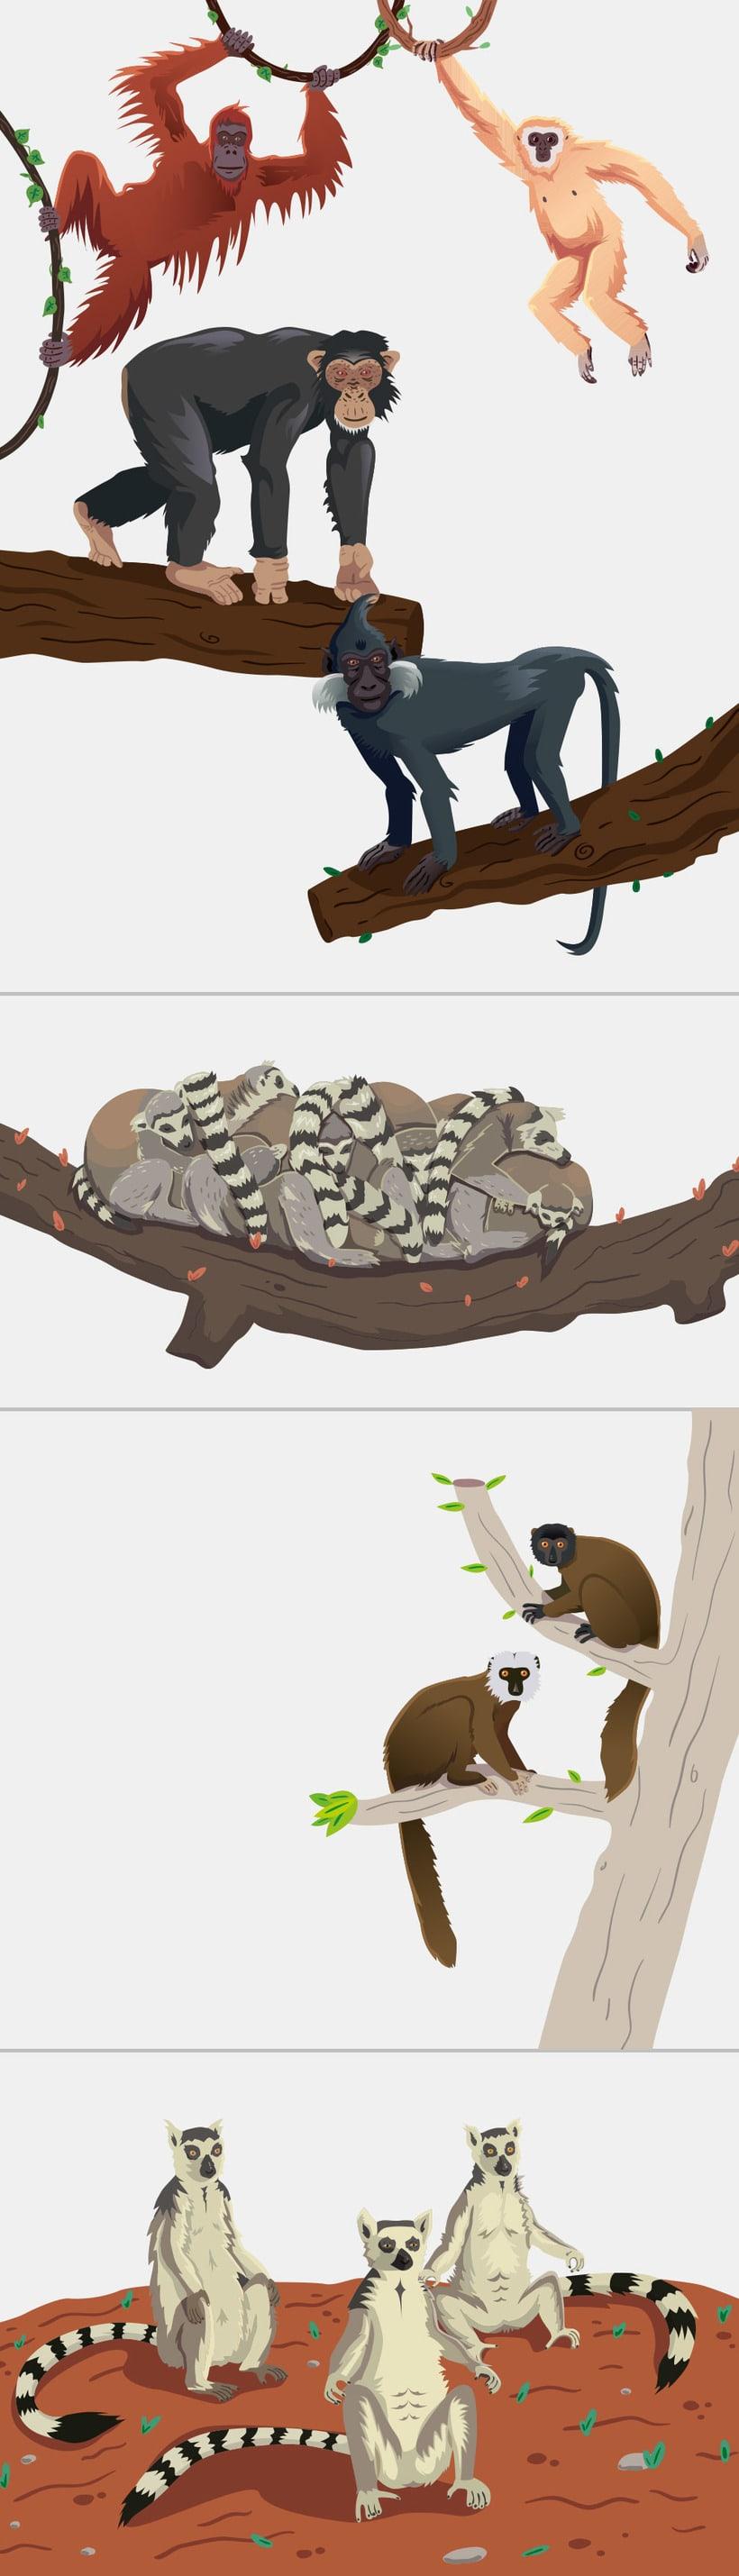 Ilustraciones para Rio Safari Elche 0